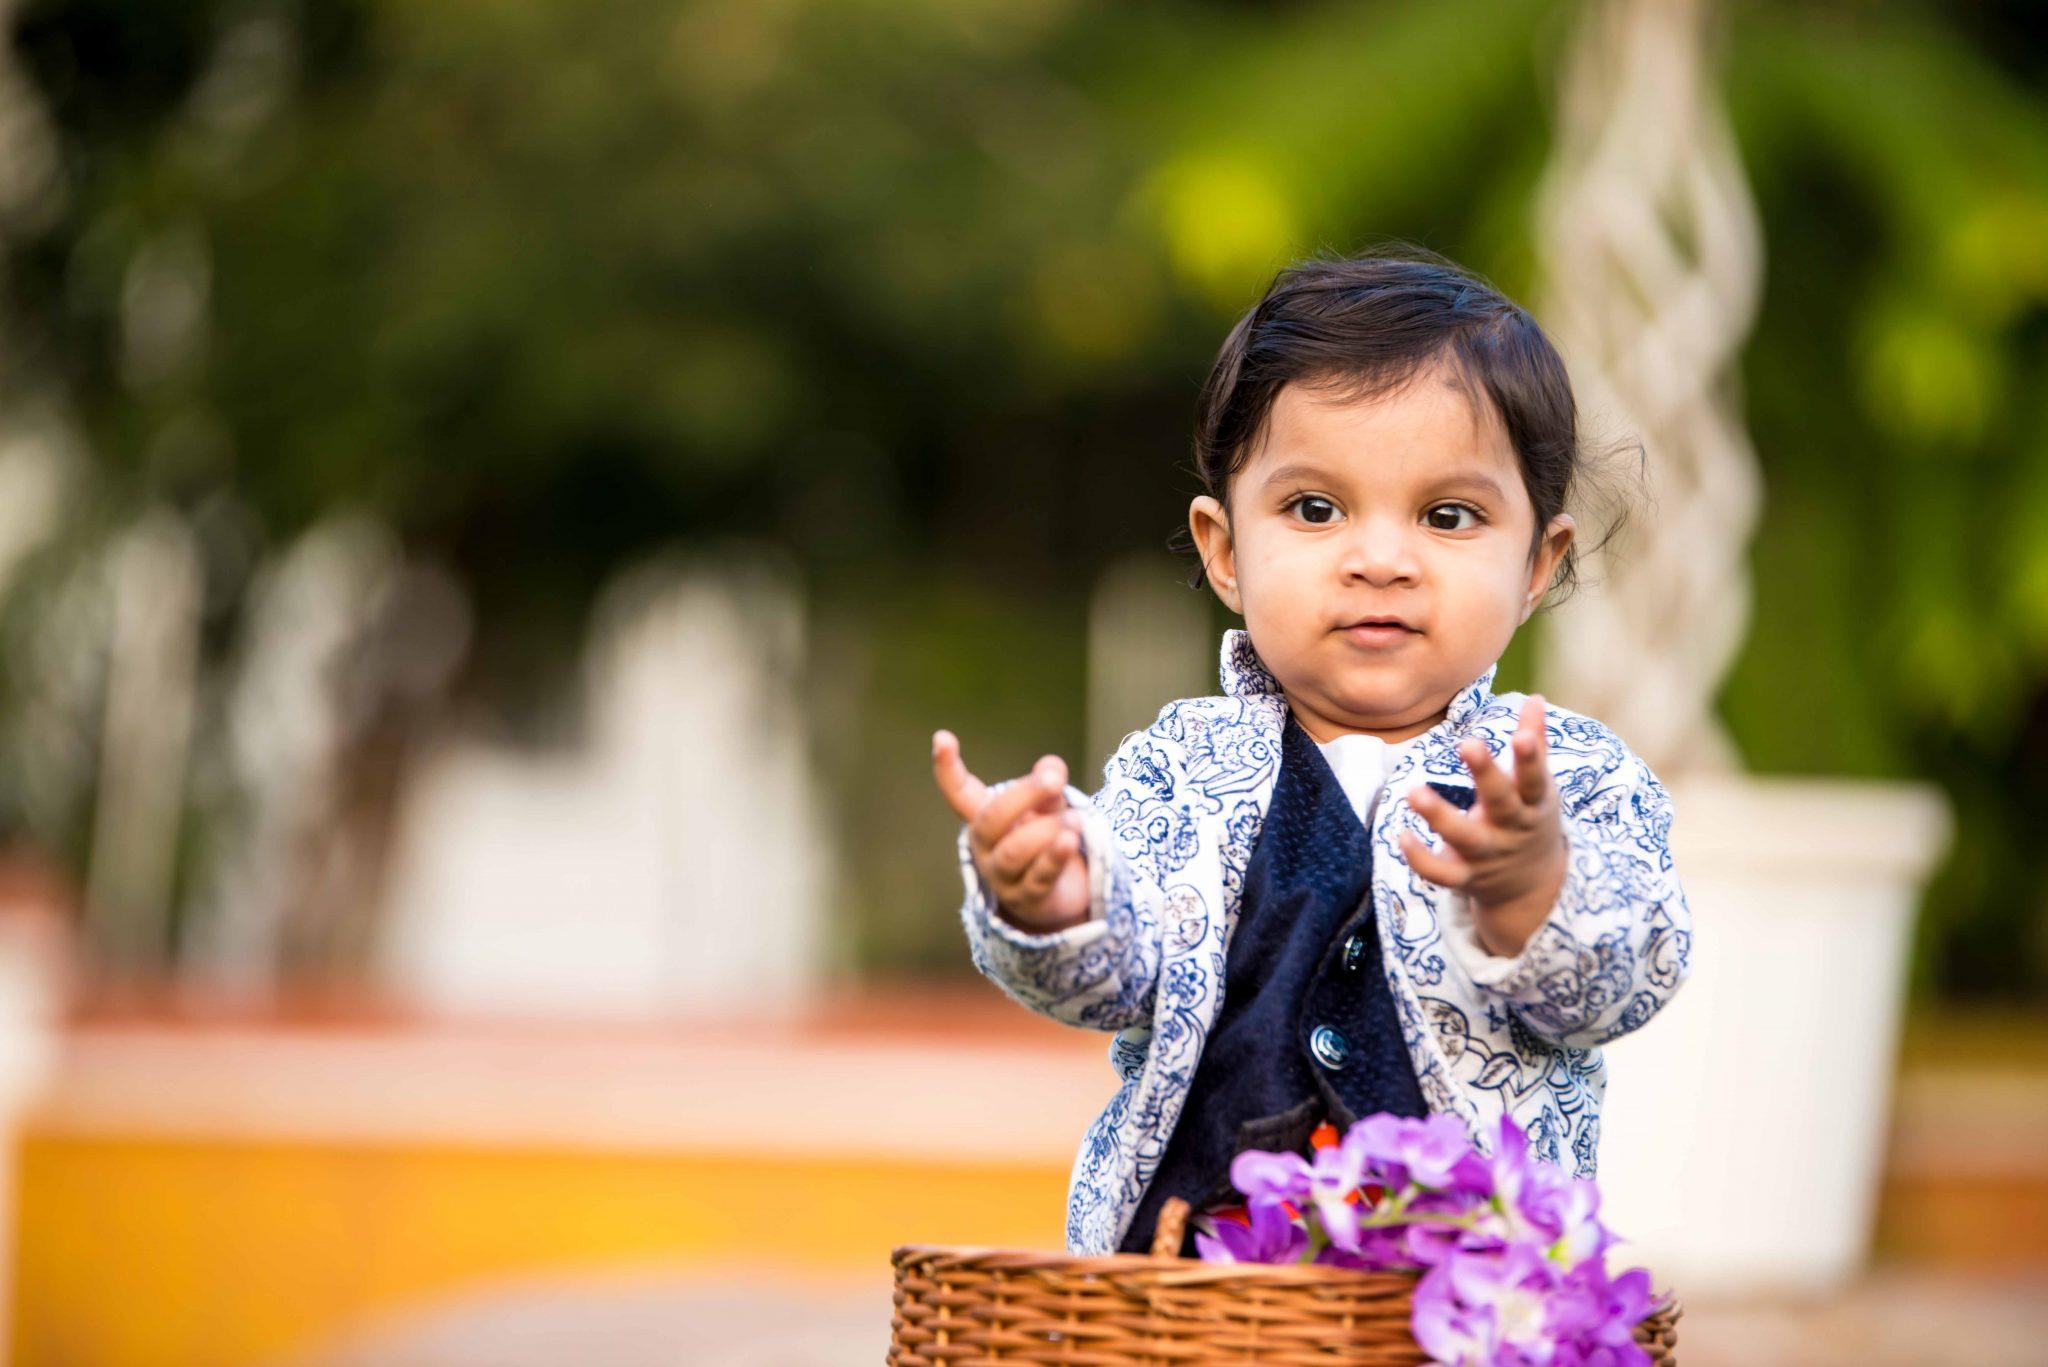 kids photoshoot kids photography baby boy photoshoot pre birthday photoshoot hitech city hyderabad telangana